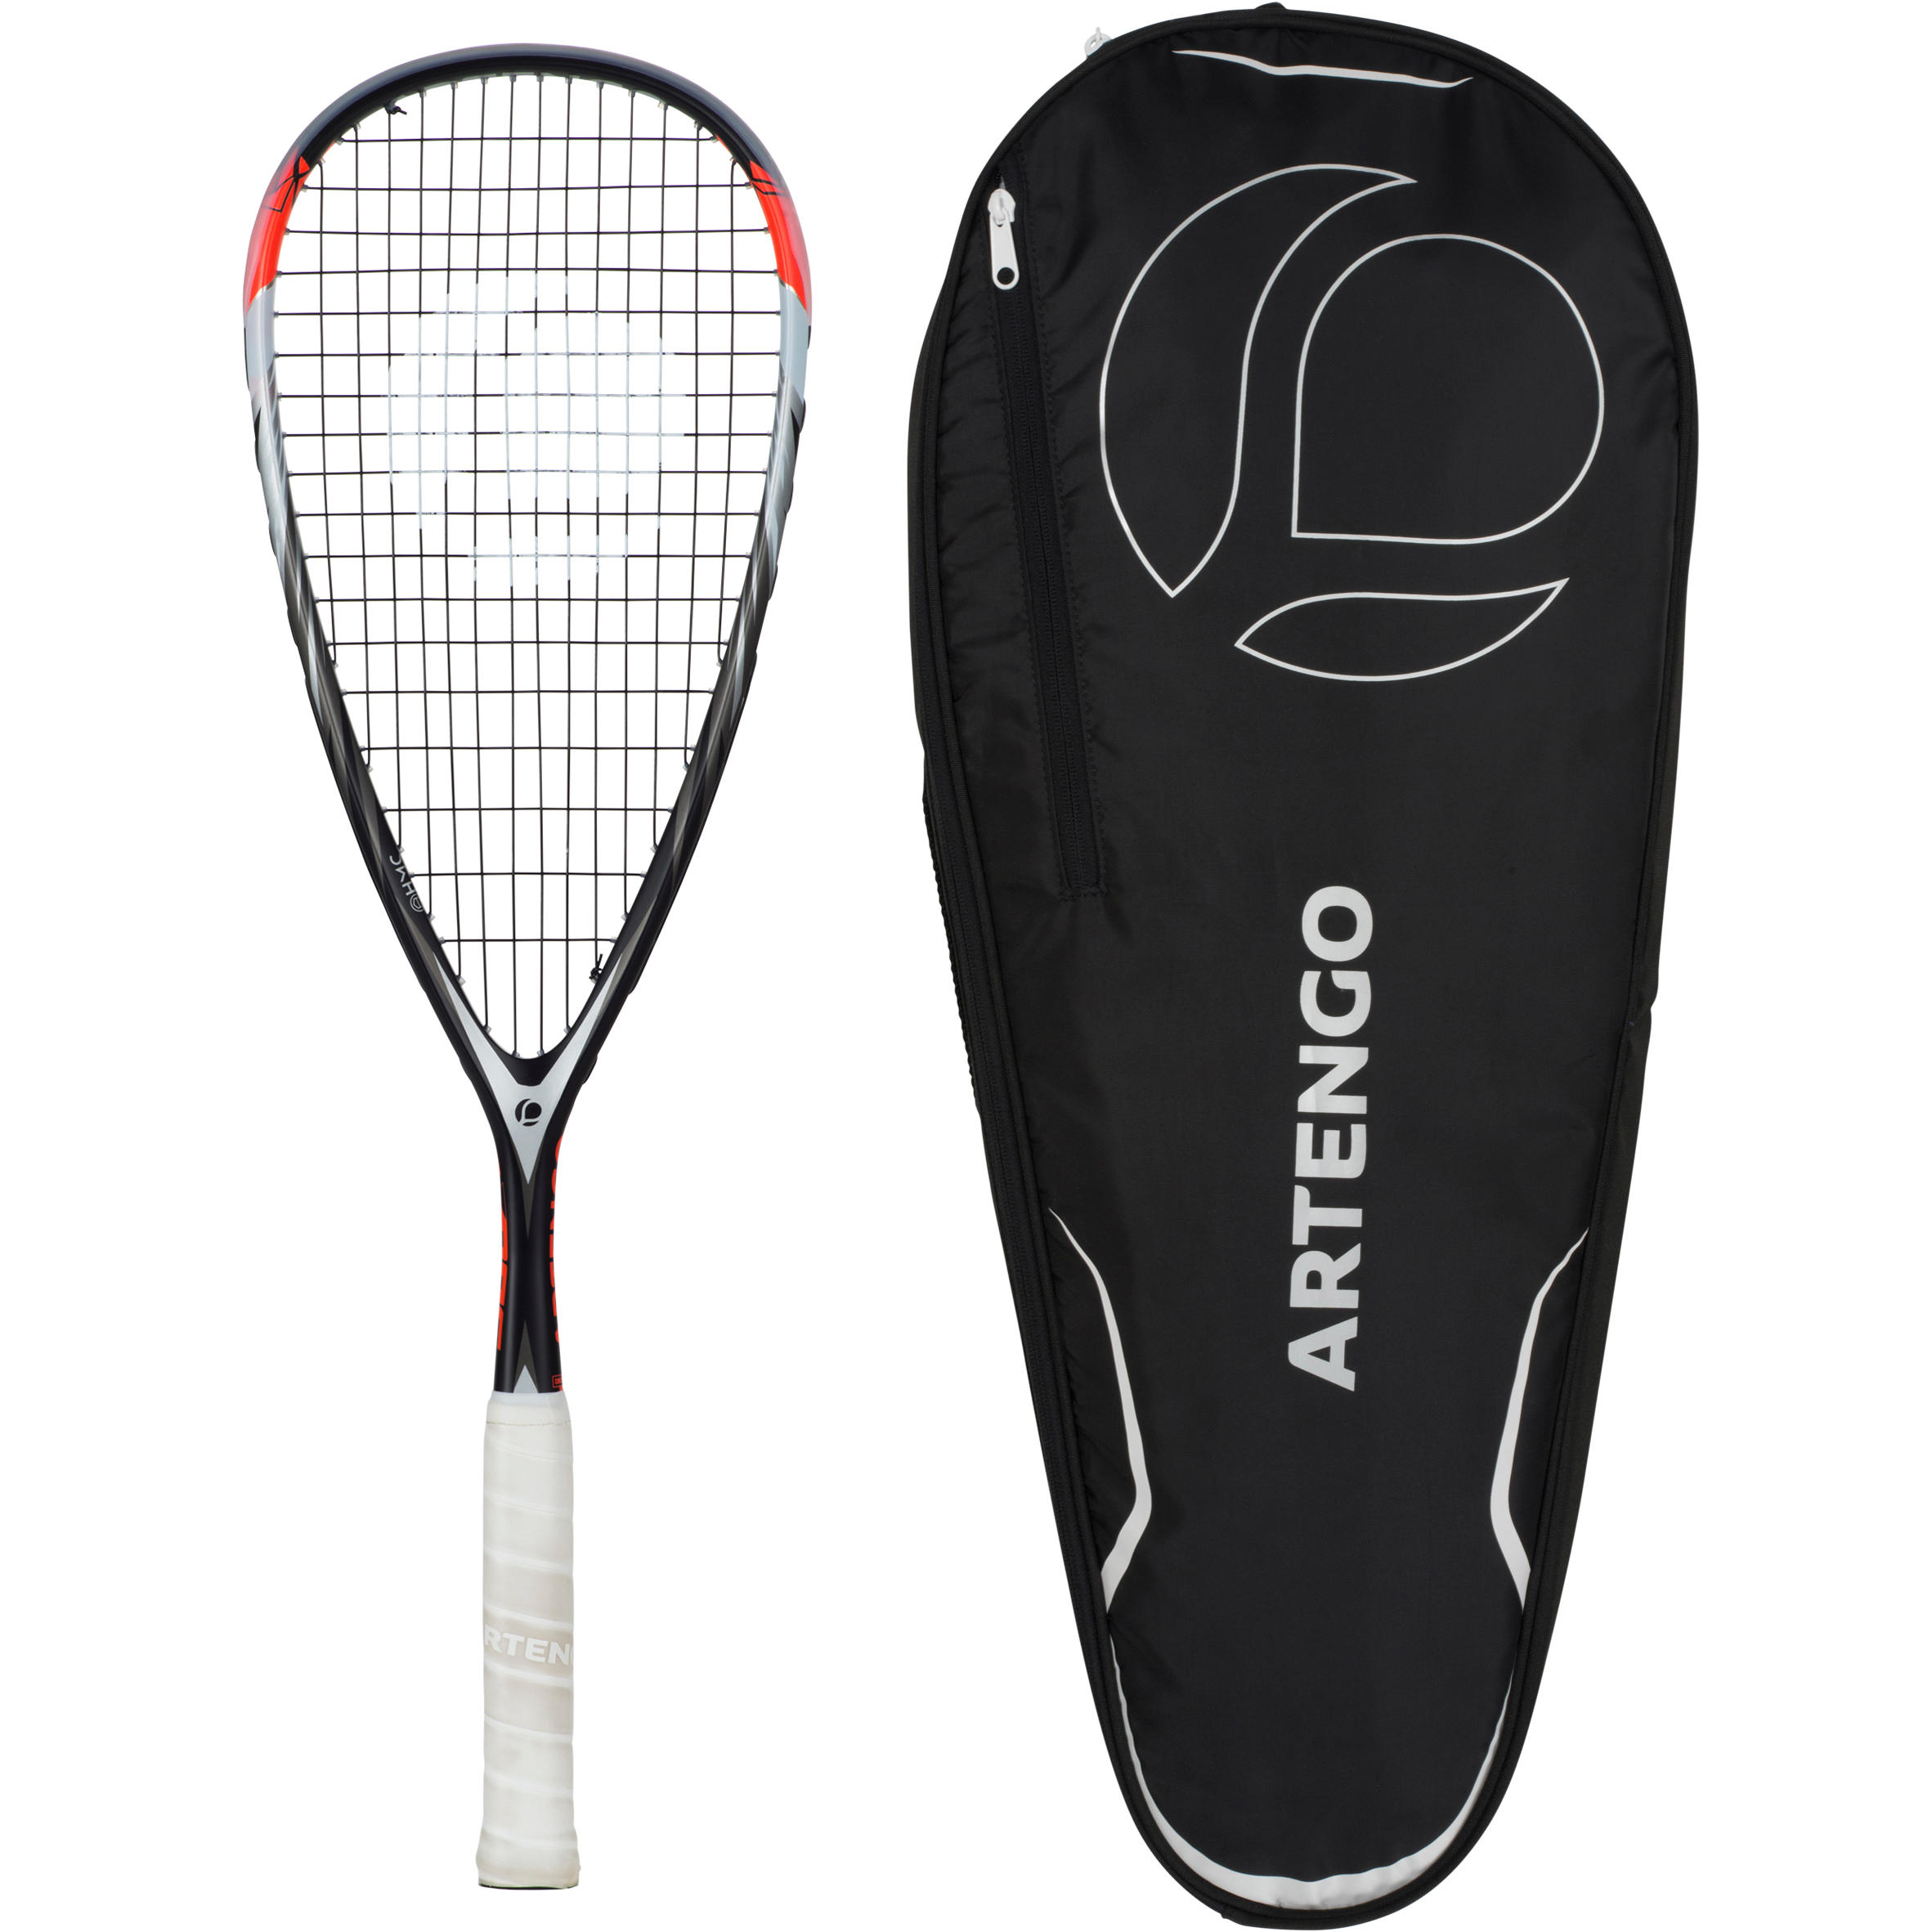 Artengo Set squashracket SR 560 (racket SR 560 en tas voor 3 rackets)